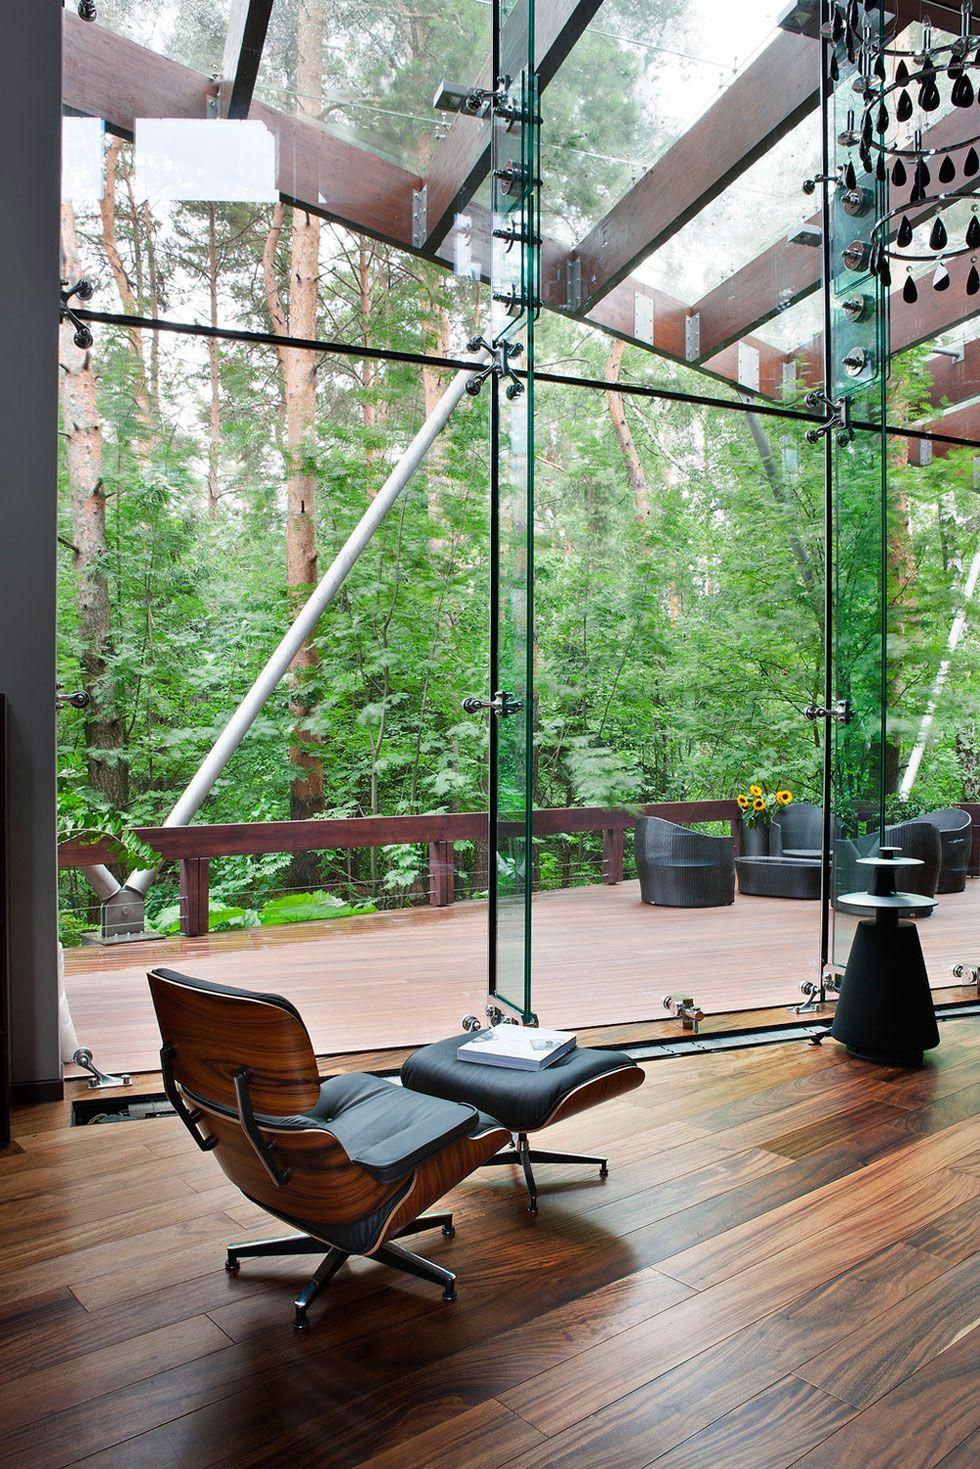 Cabana luxuosa no frio da floresta | Moscow, House and Architecture